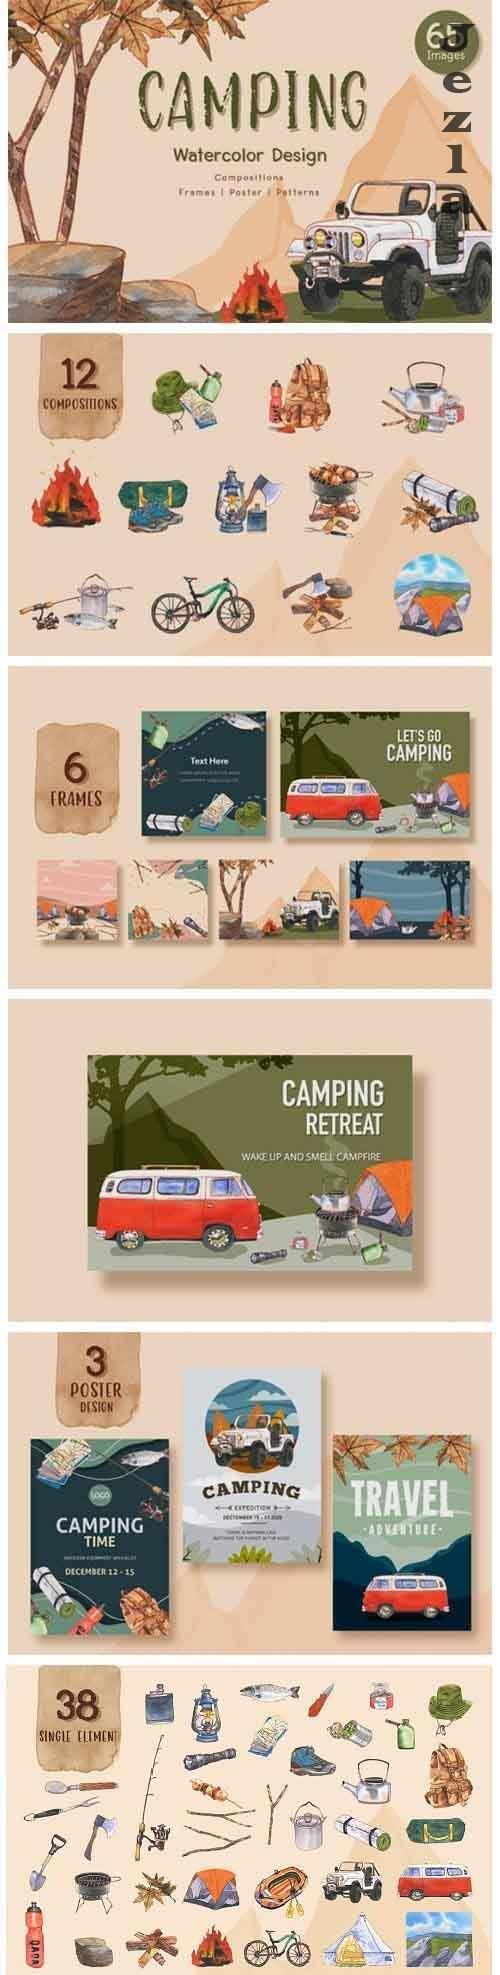 Camping Travel Watercolor - 5265190